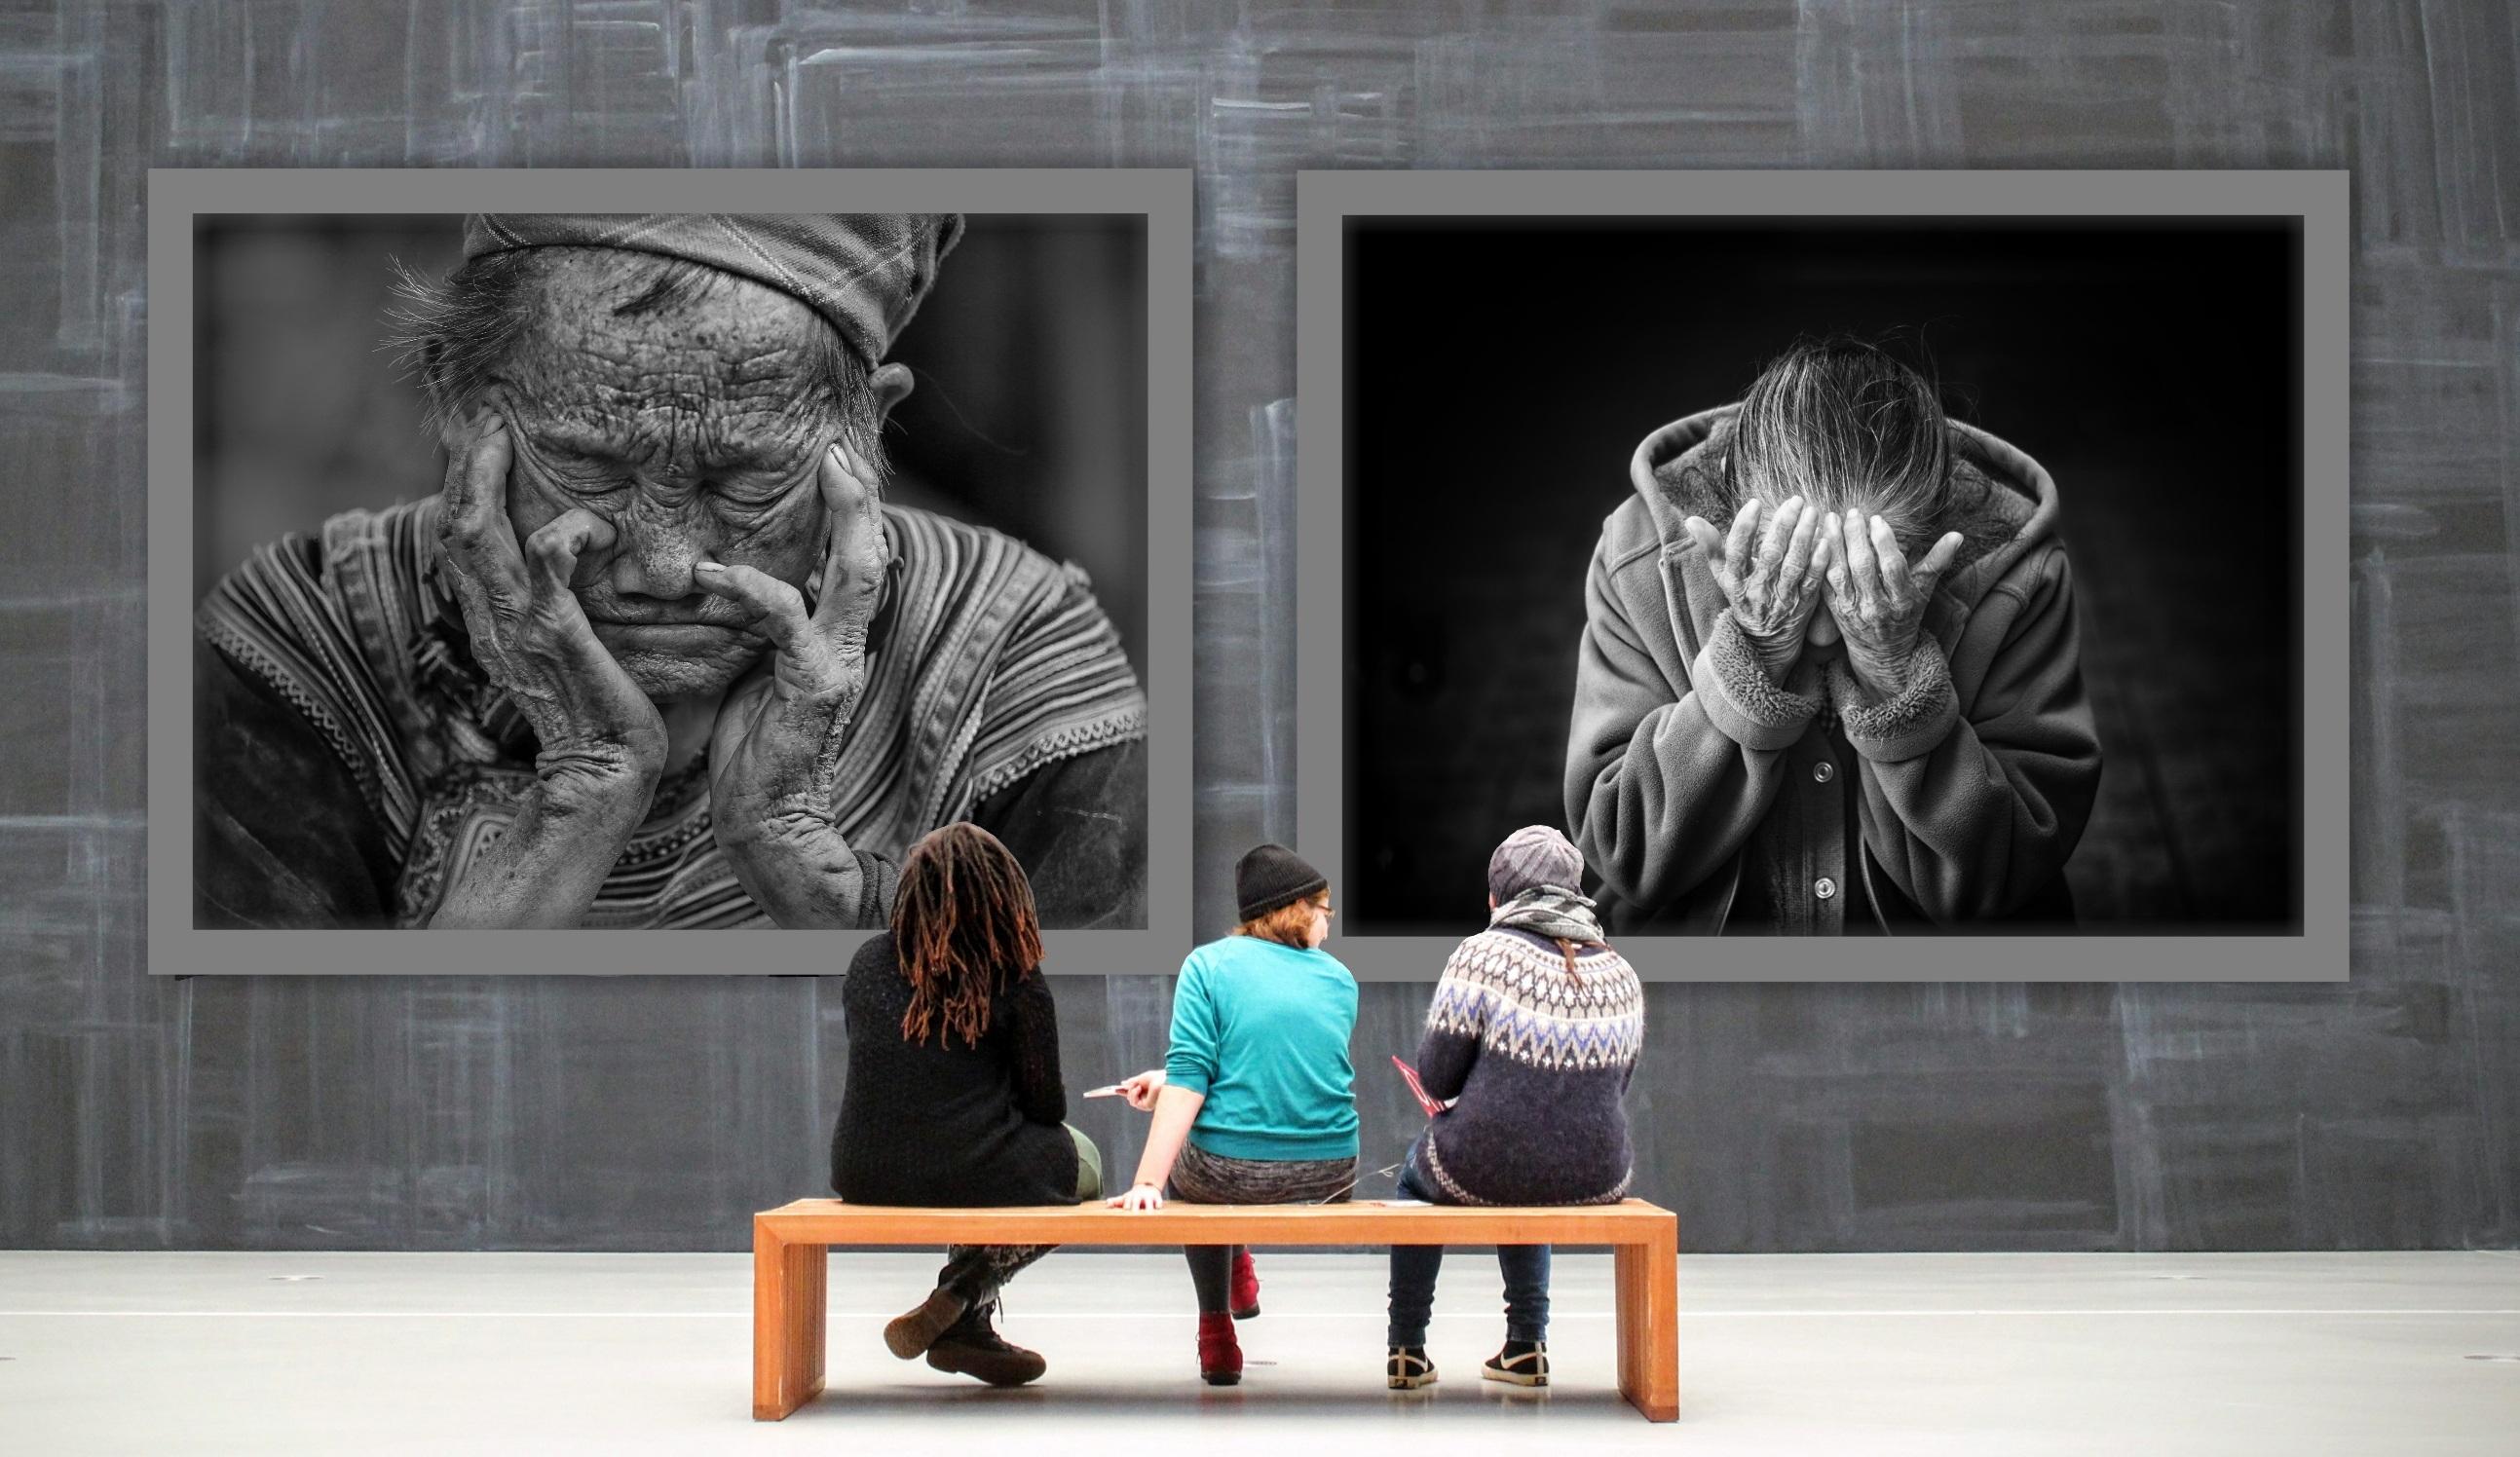 Women Looking at an Art Gallery Exhibition HD Wallpaper